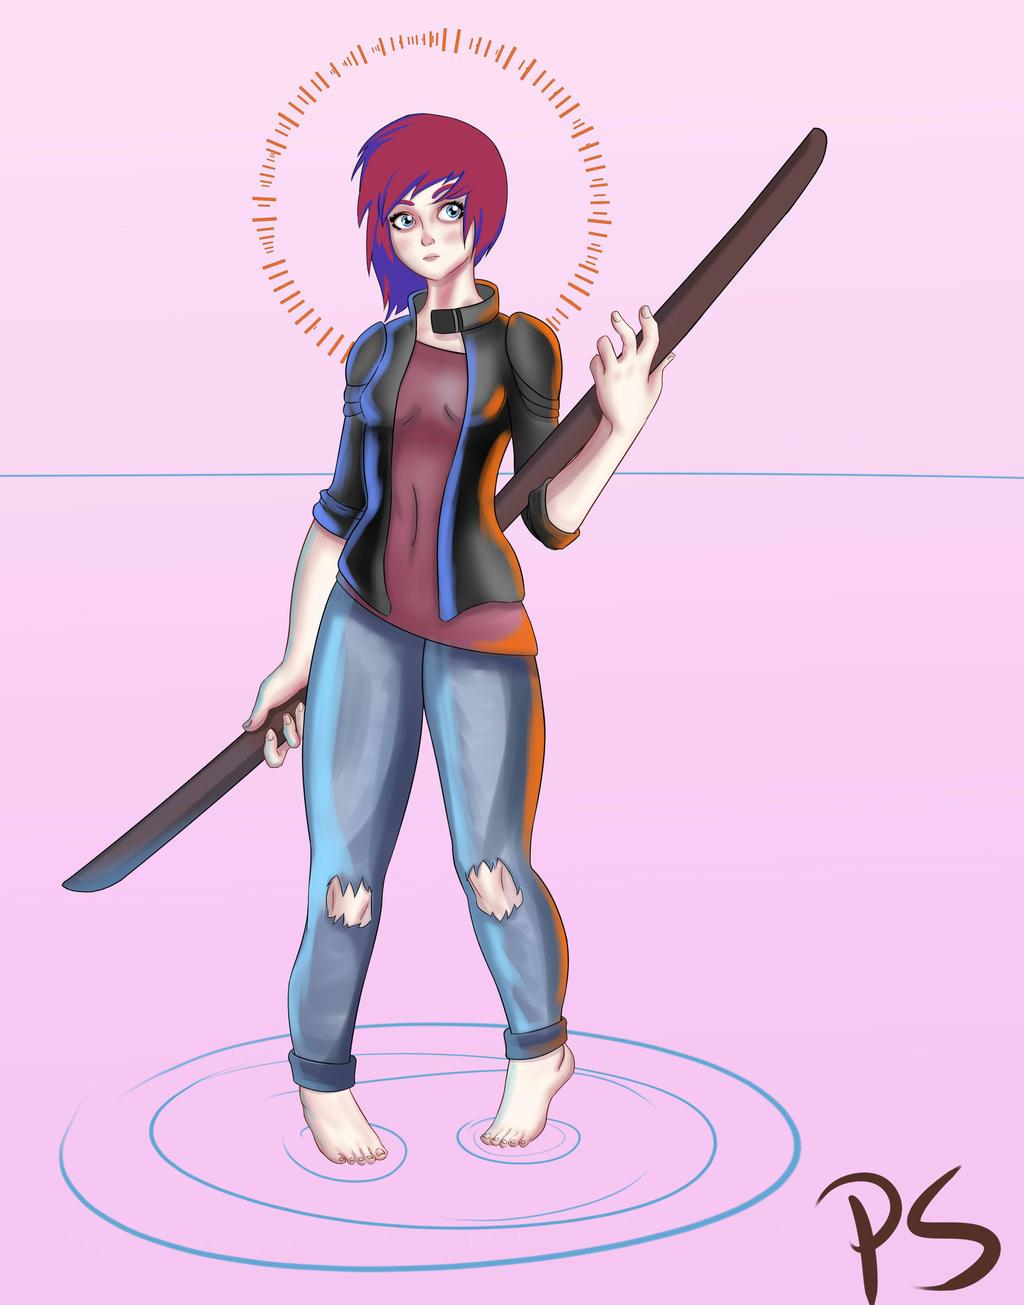 Deviantart Character Design : Original character design by thephilip on deviantart